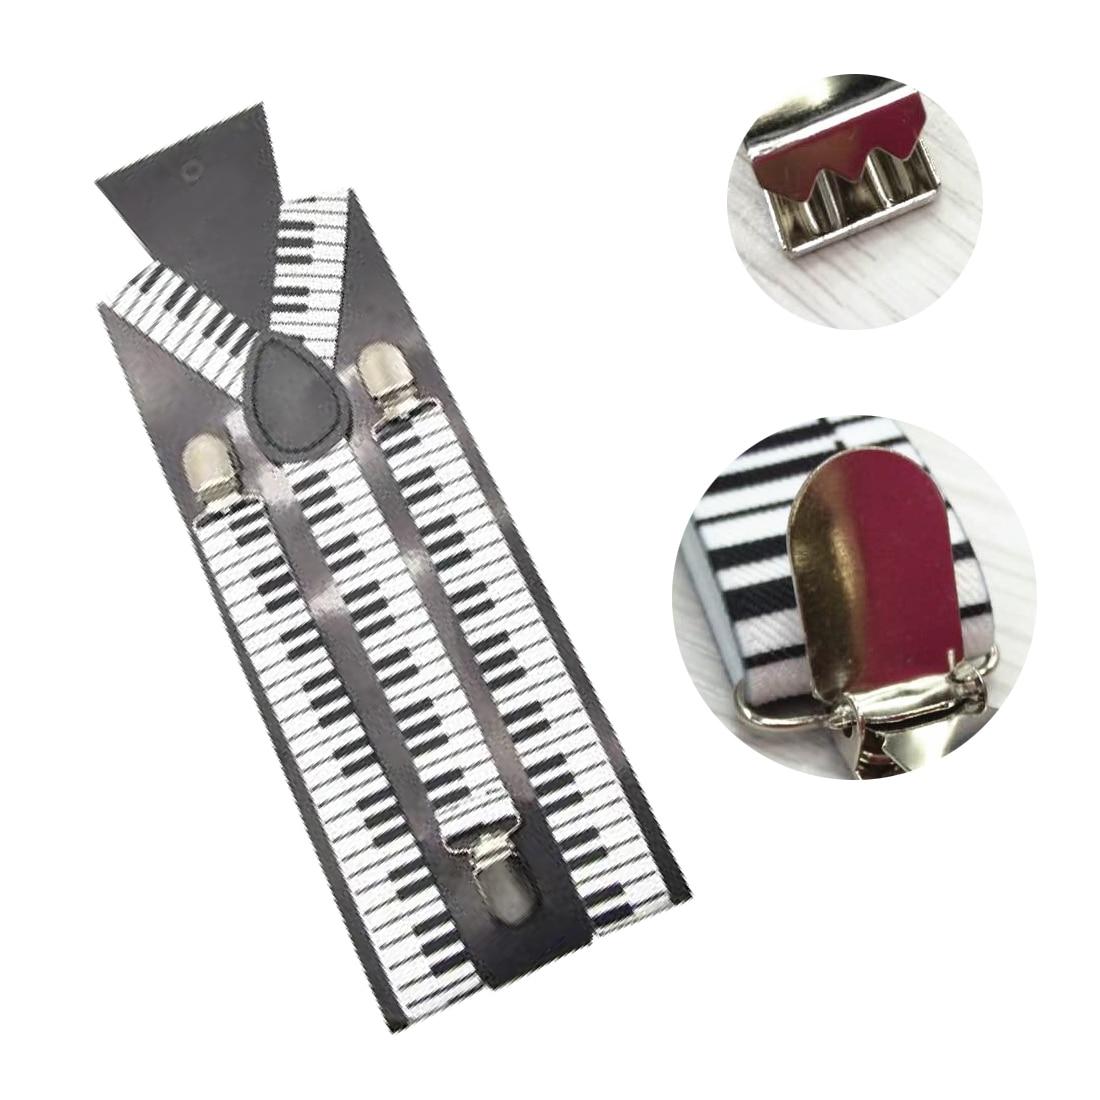 2.5cm/1Inch Wide Men Unisex Piano Key Board Pattern Suspender Clip-On Braces Elastic Braces Y-Back Suspenders